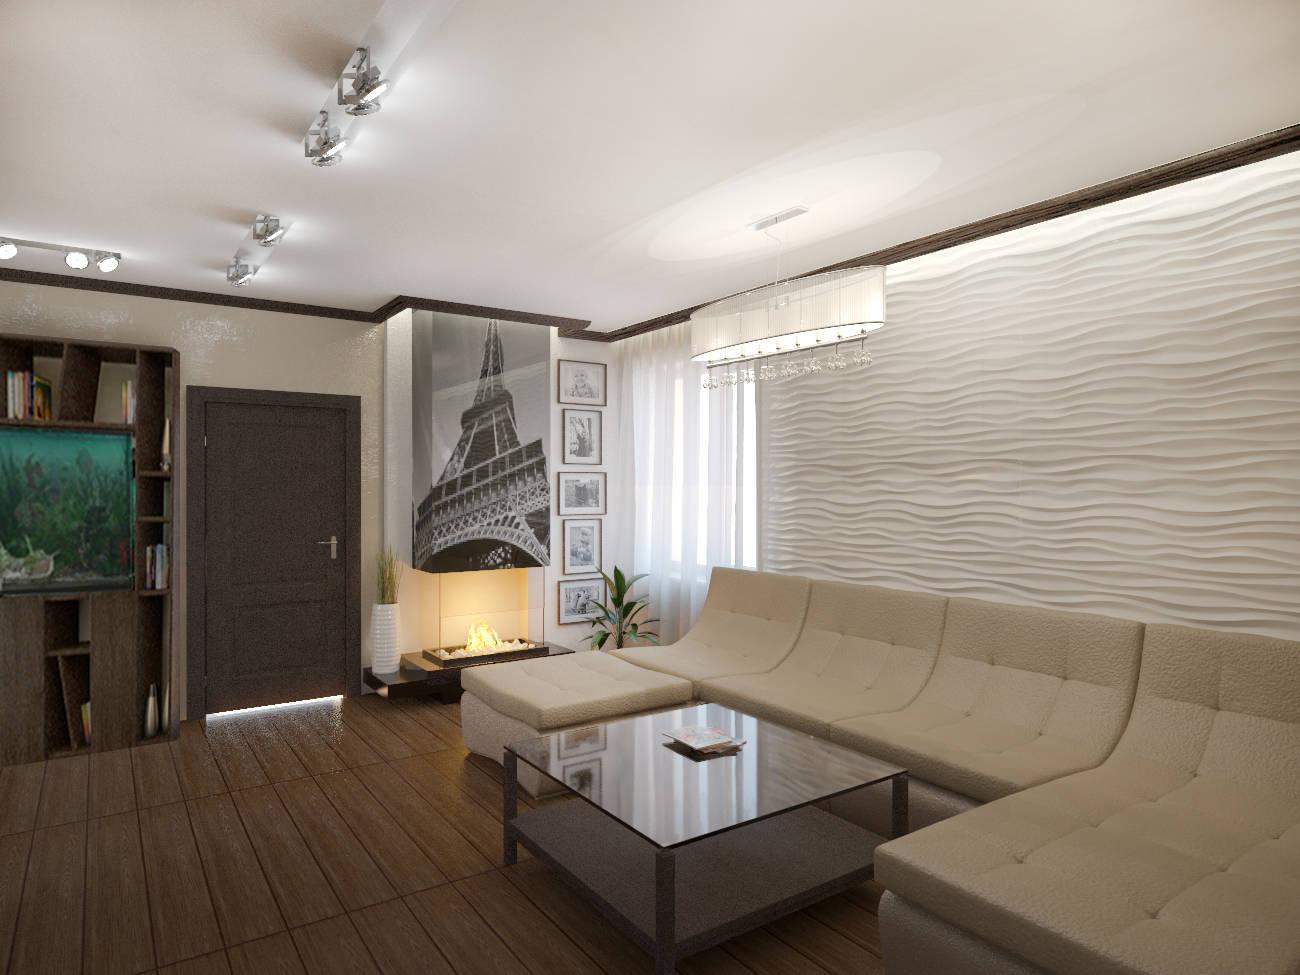 Квартира для молодой семьи, 92 м2